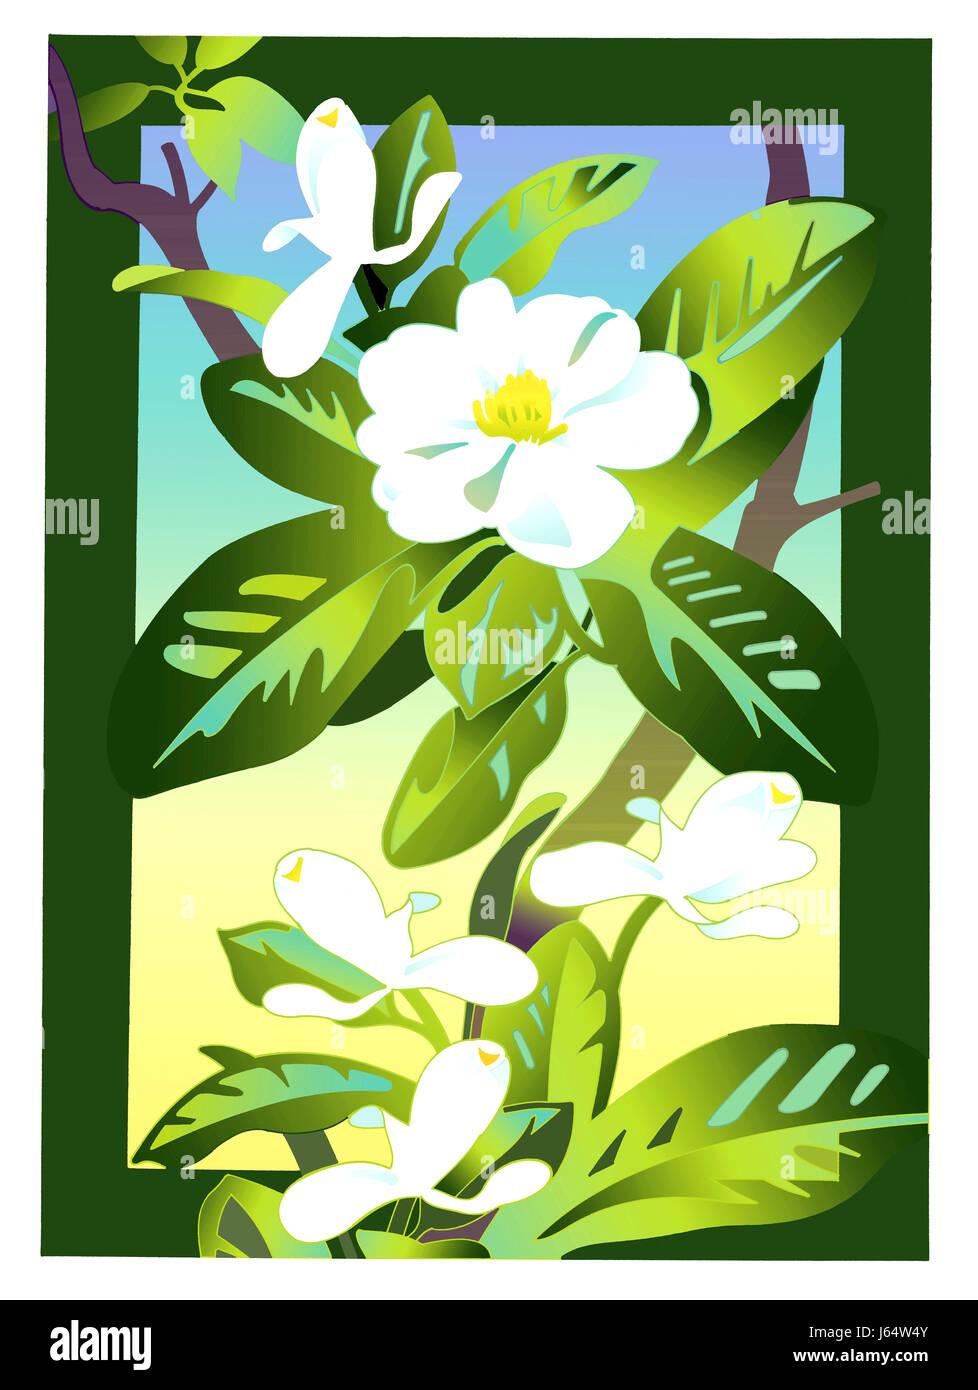 White apple blossoms - Stock Image